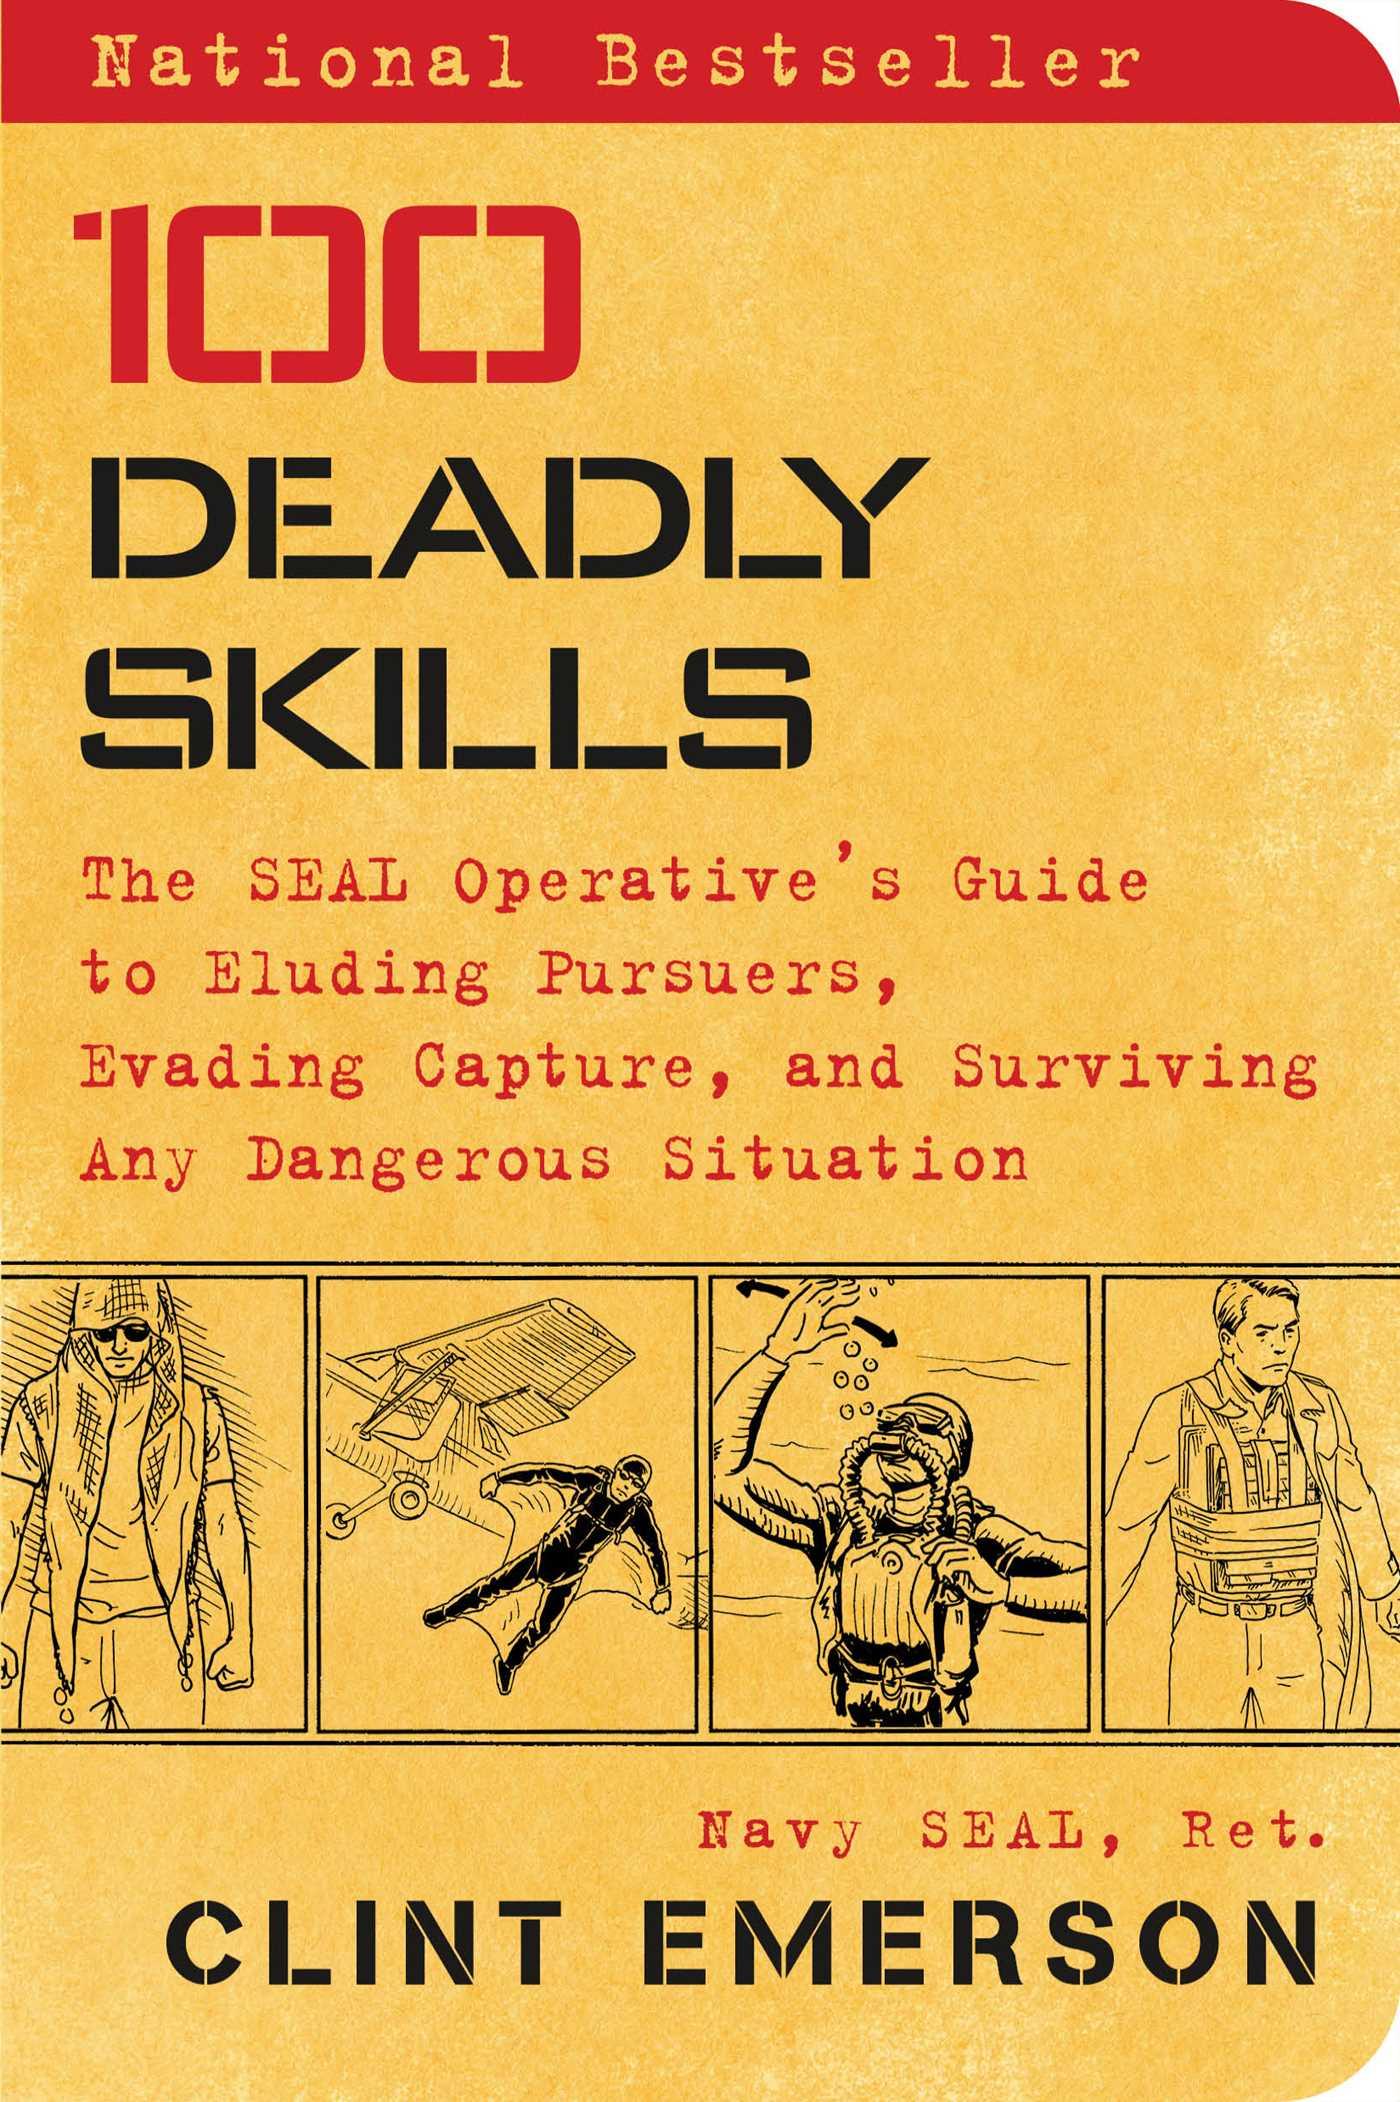 100 deadly skills 9781476796055 hr